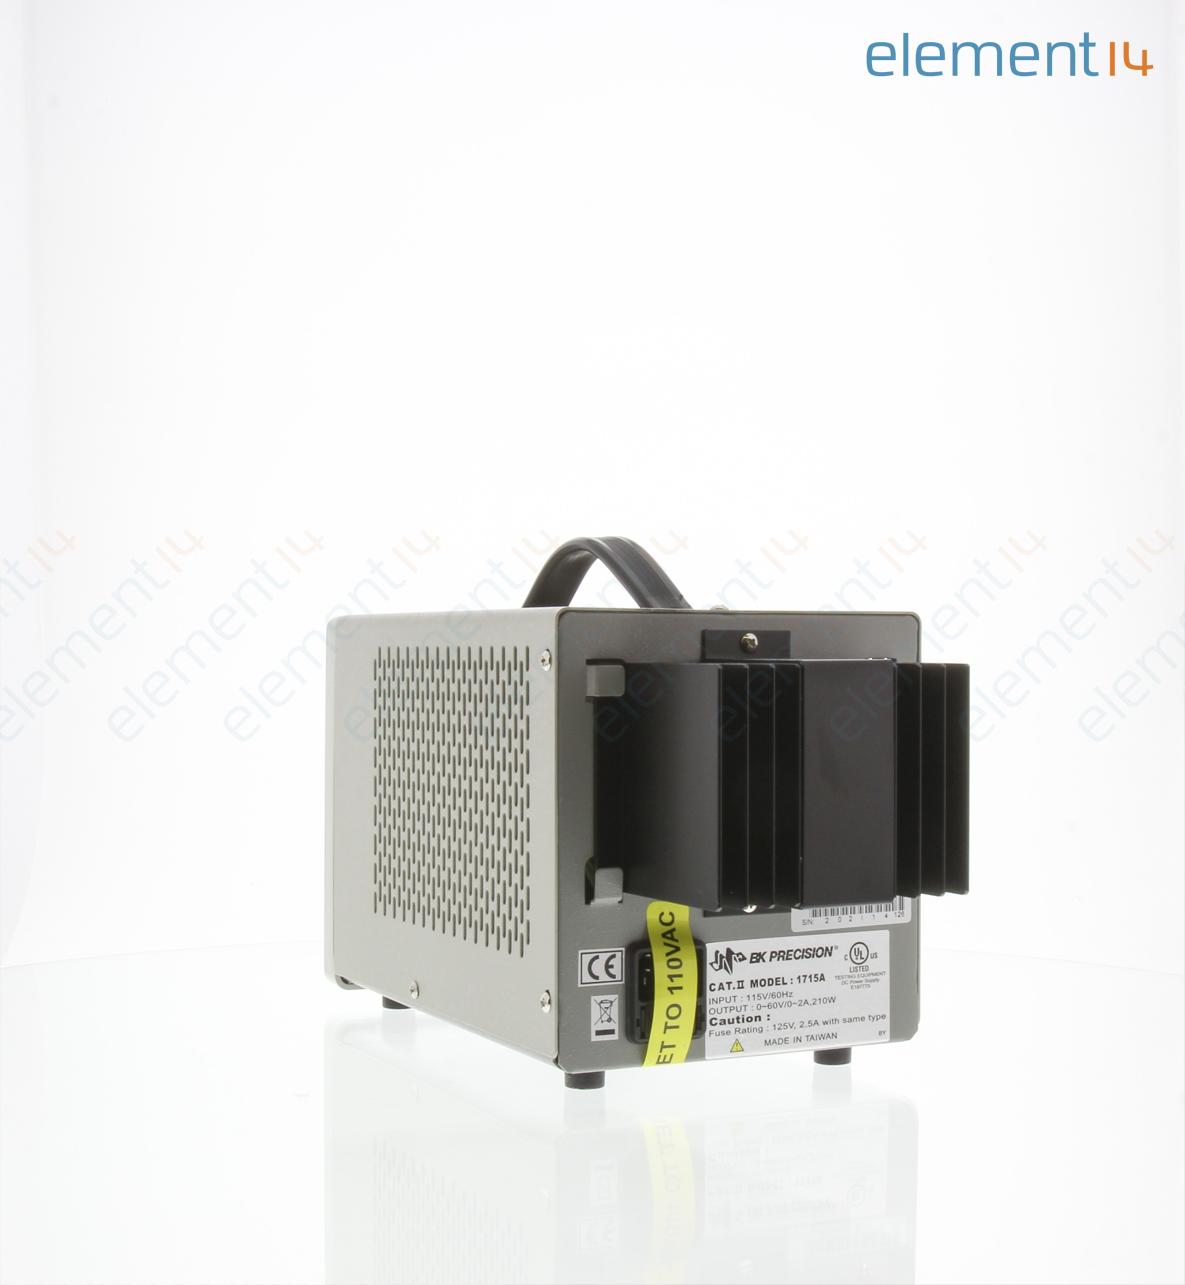 1715a B K Precision Bench Power Supply Single Adjustable 1 Output 0 V 60 V 0 A 2 A